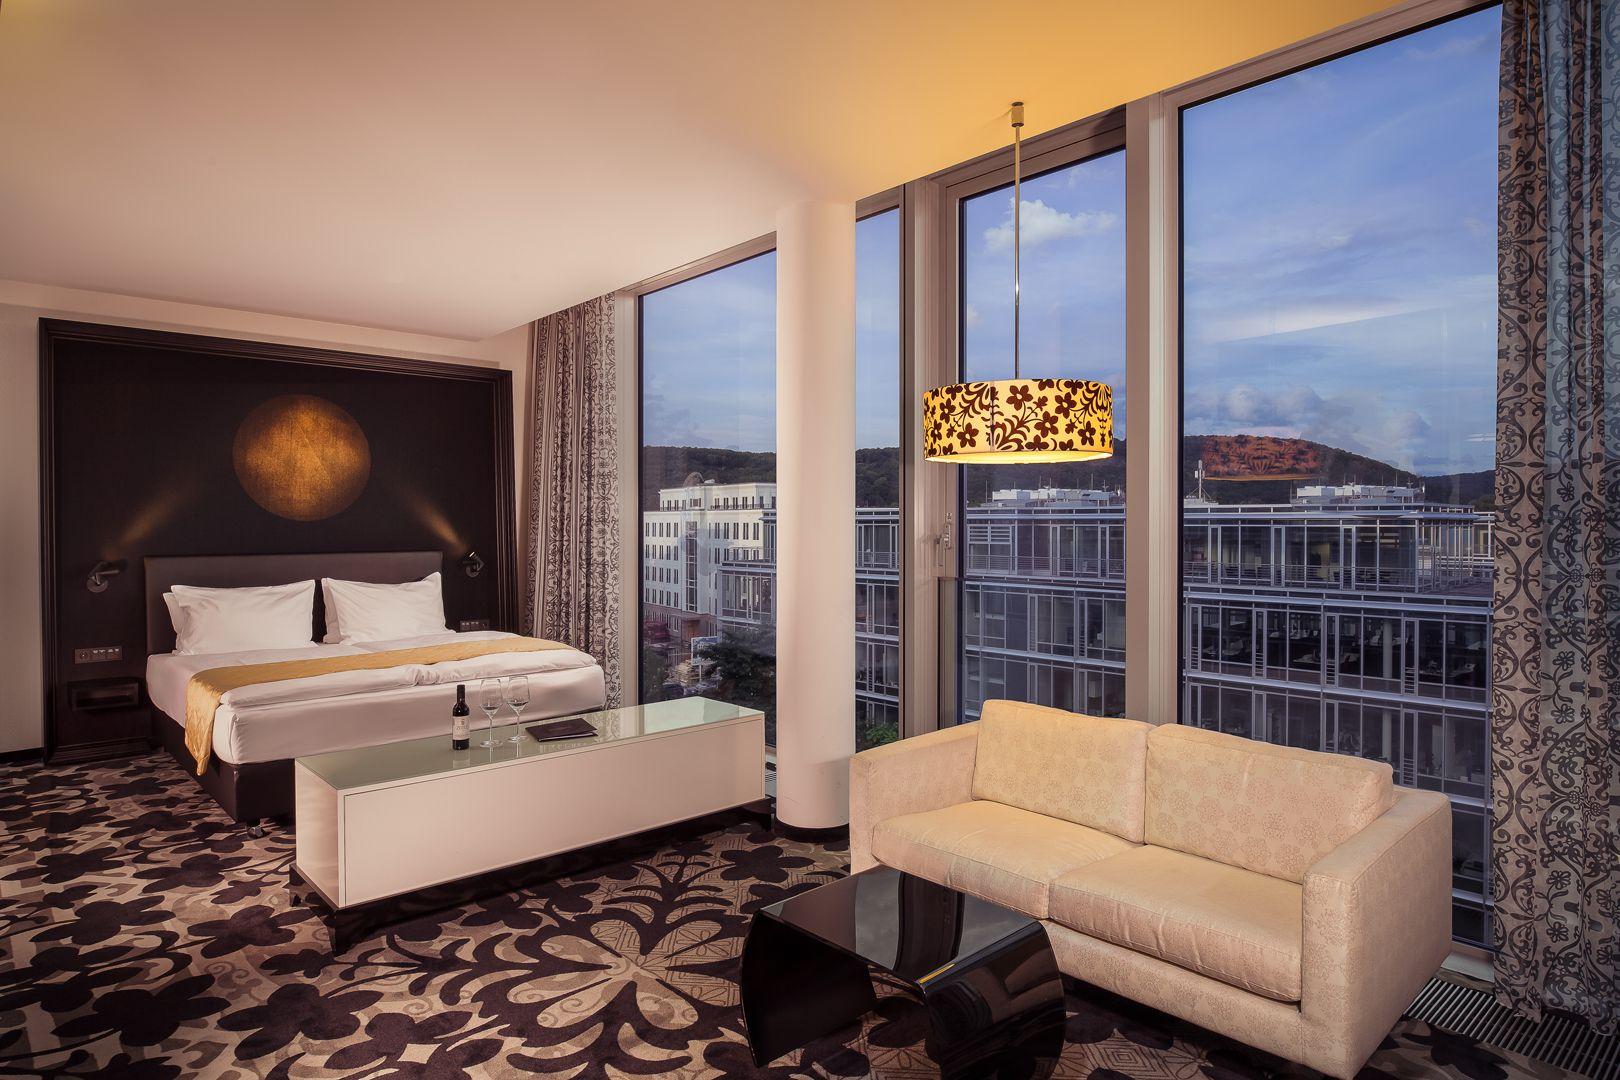 hotel kameha grand bonn anspuchsvolle Architektur